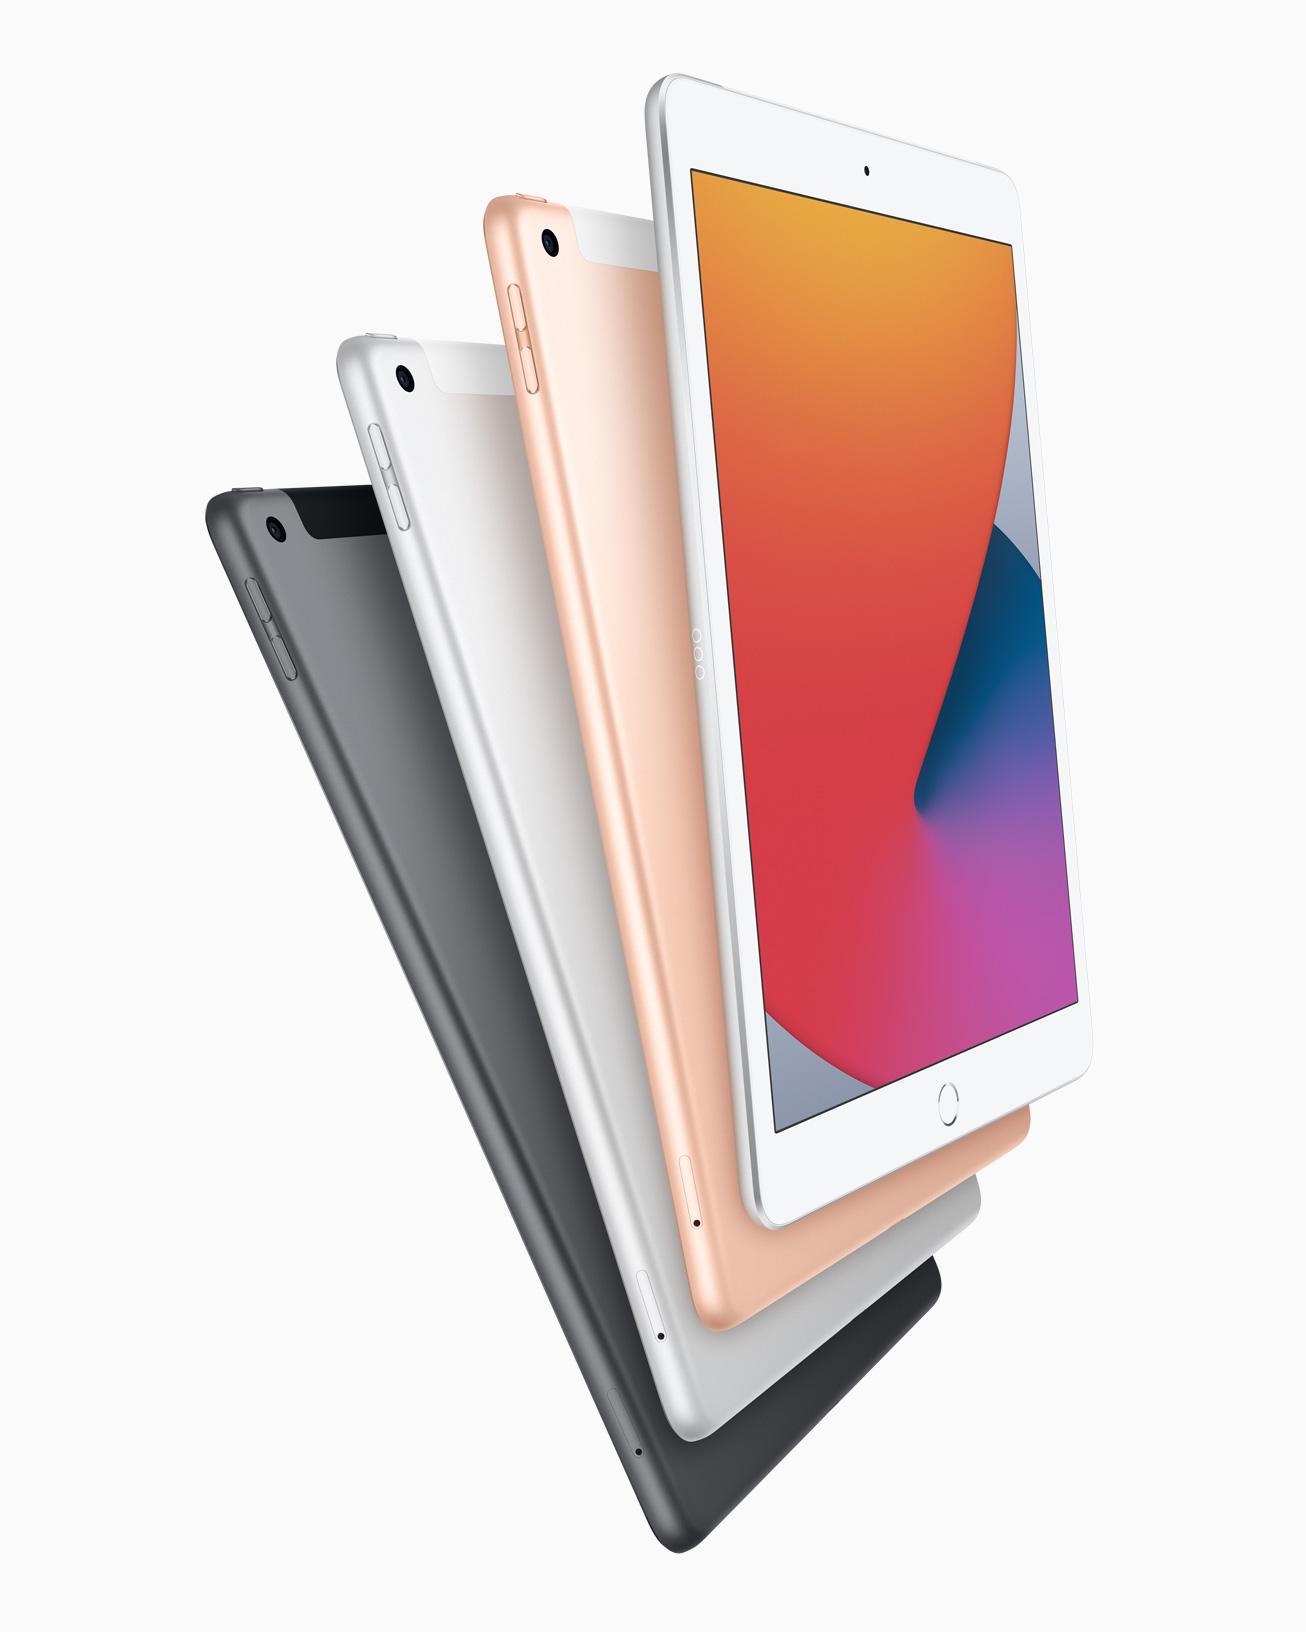 8th generation iPad